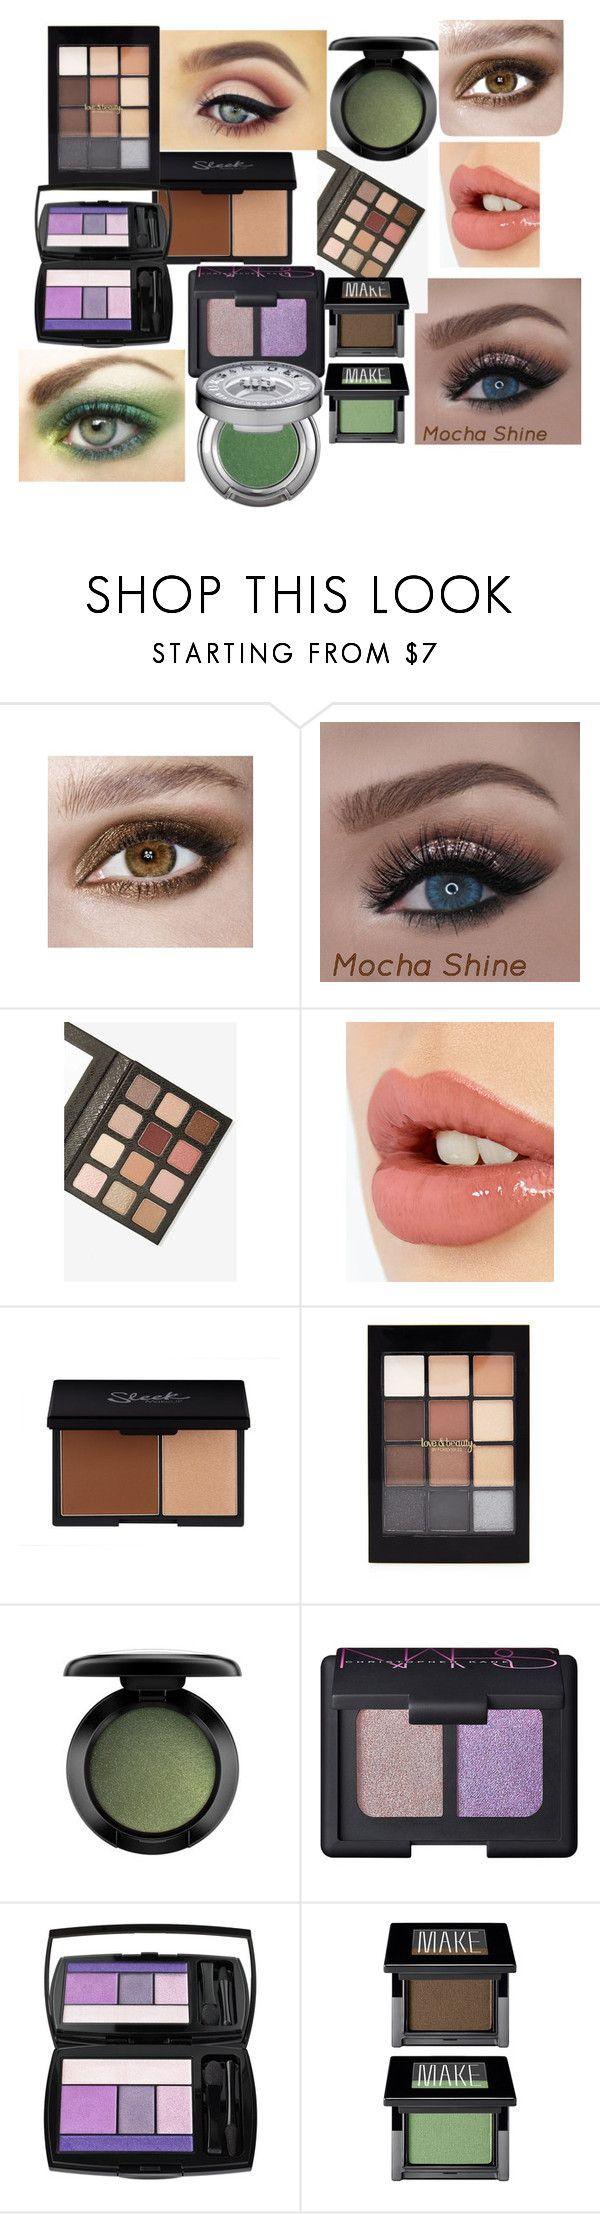 """макияж"" by artemia-13 on Polyvore featuring мода, Charlotte Tilbury, Forever 21, MAC Cosmetics, Lancôme, Make и Urban Decay"